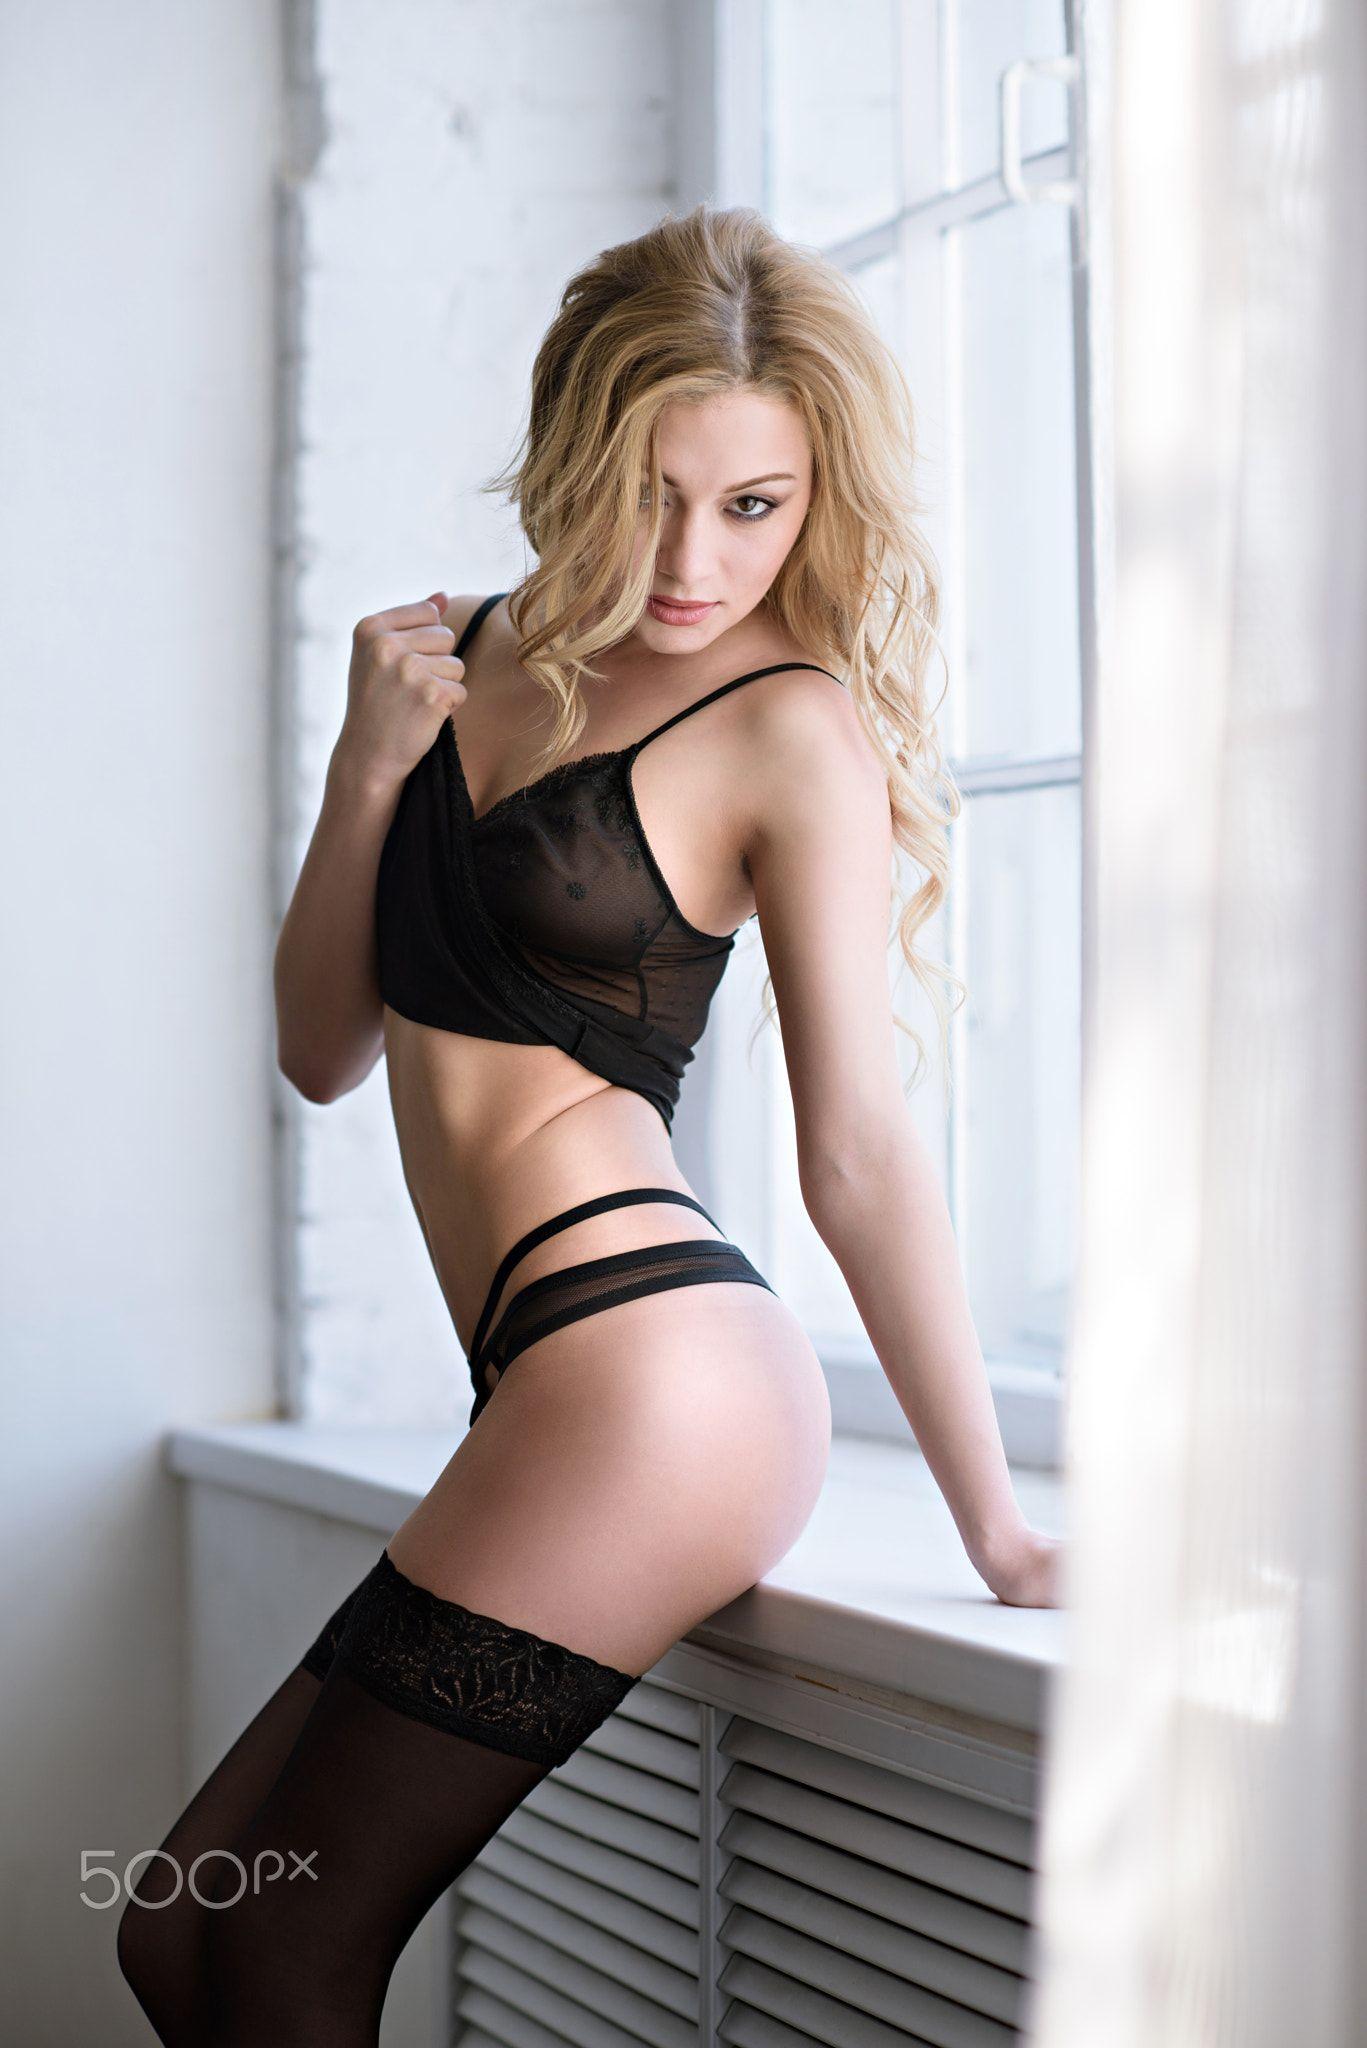 beautiful sexy lady in elegant black panties and stockings